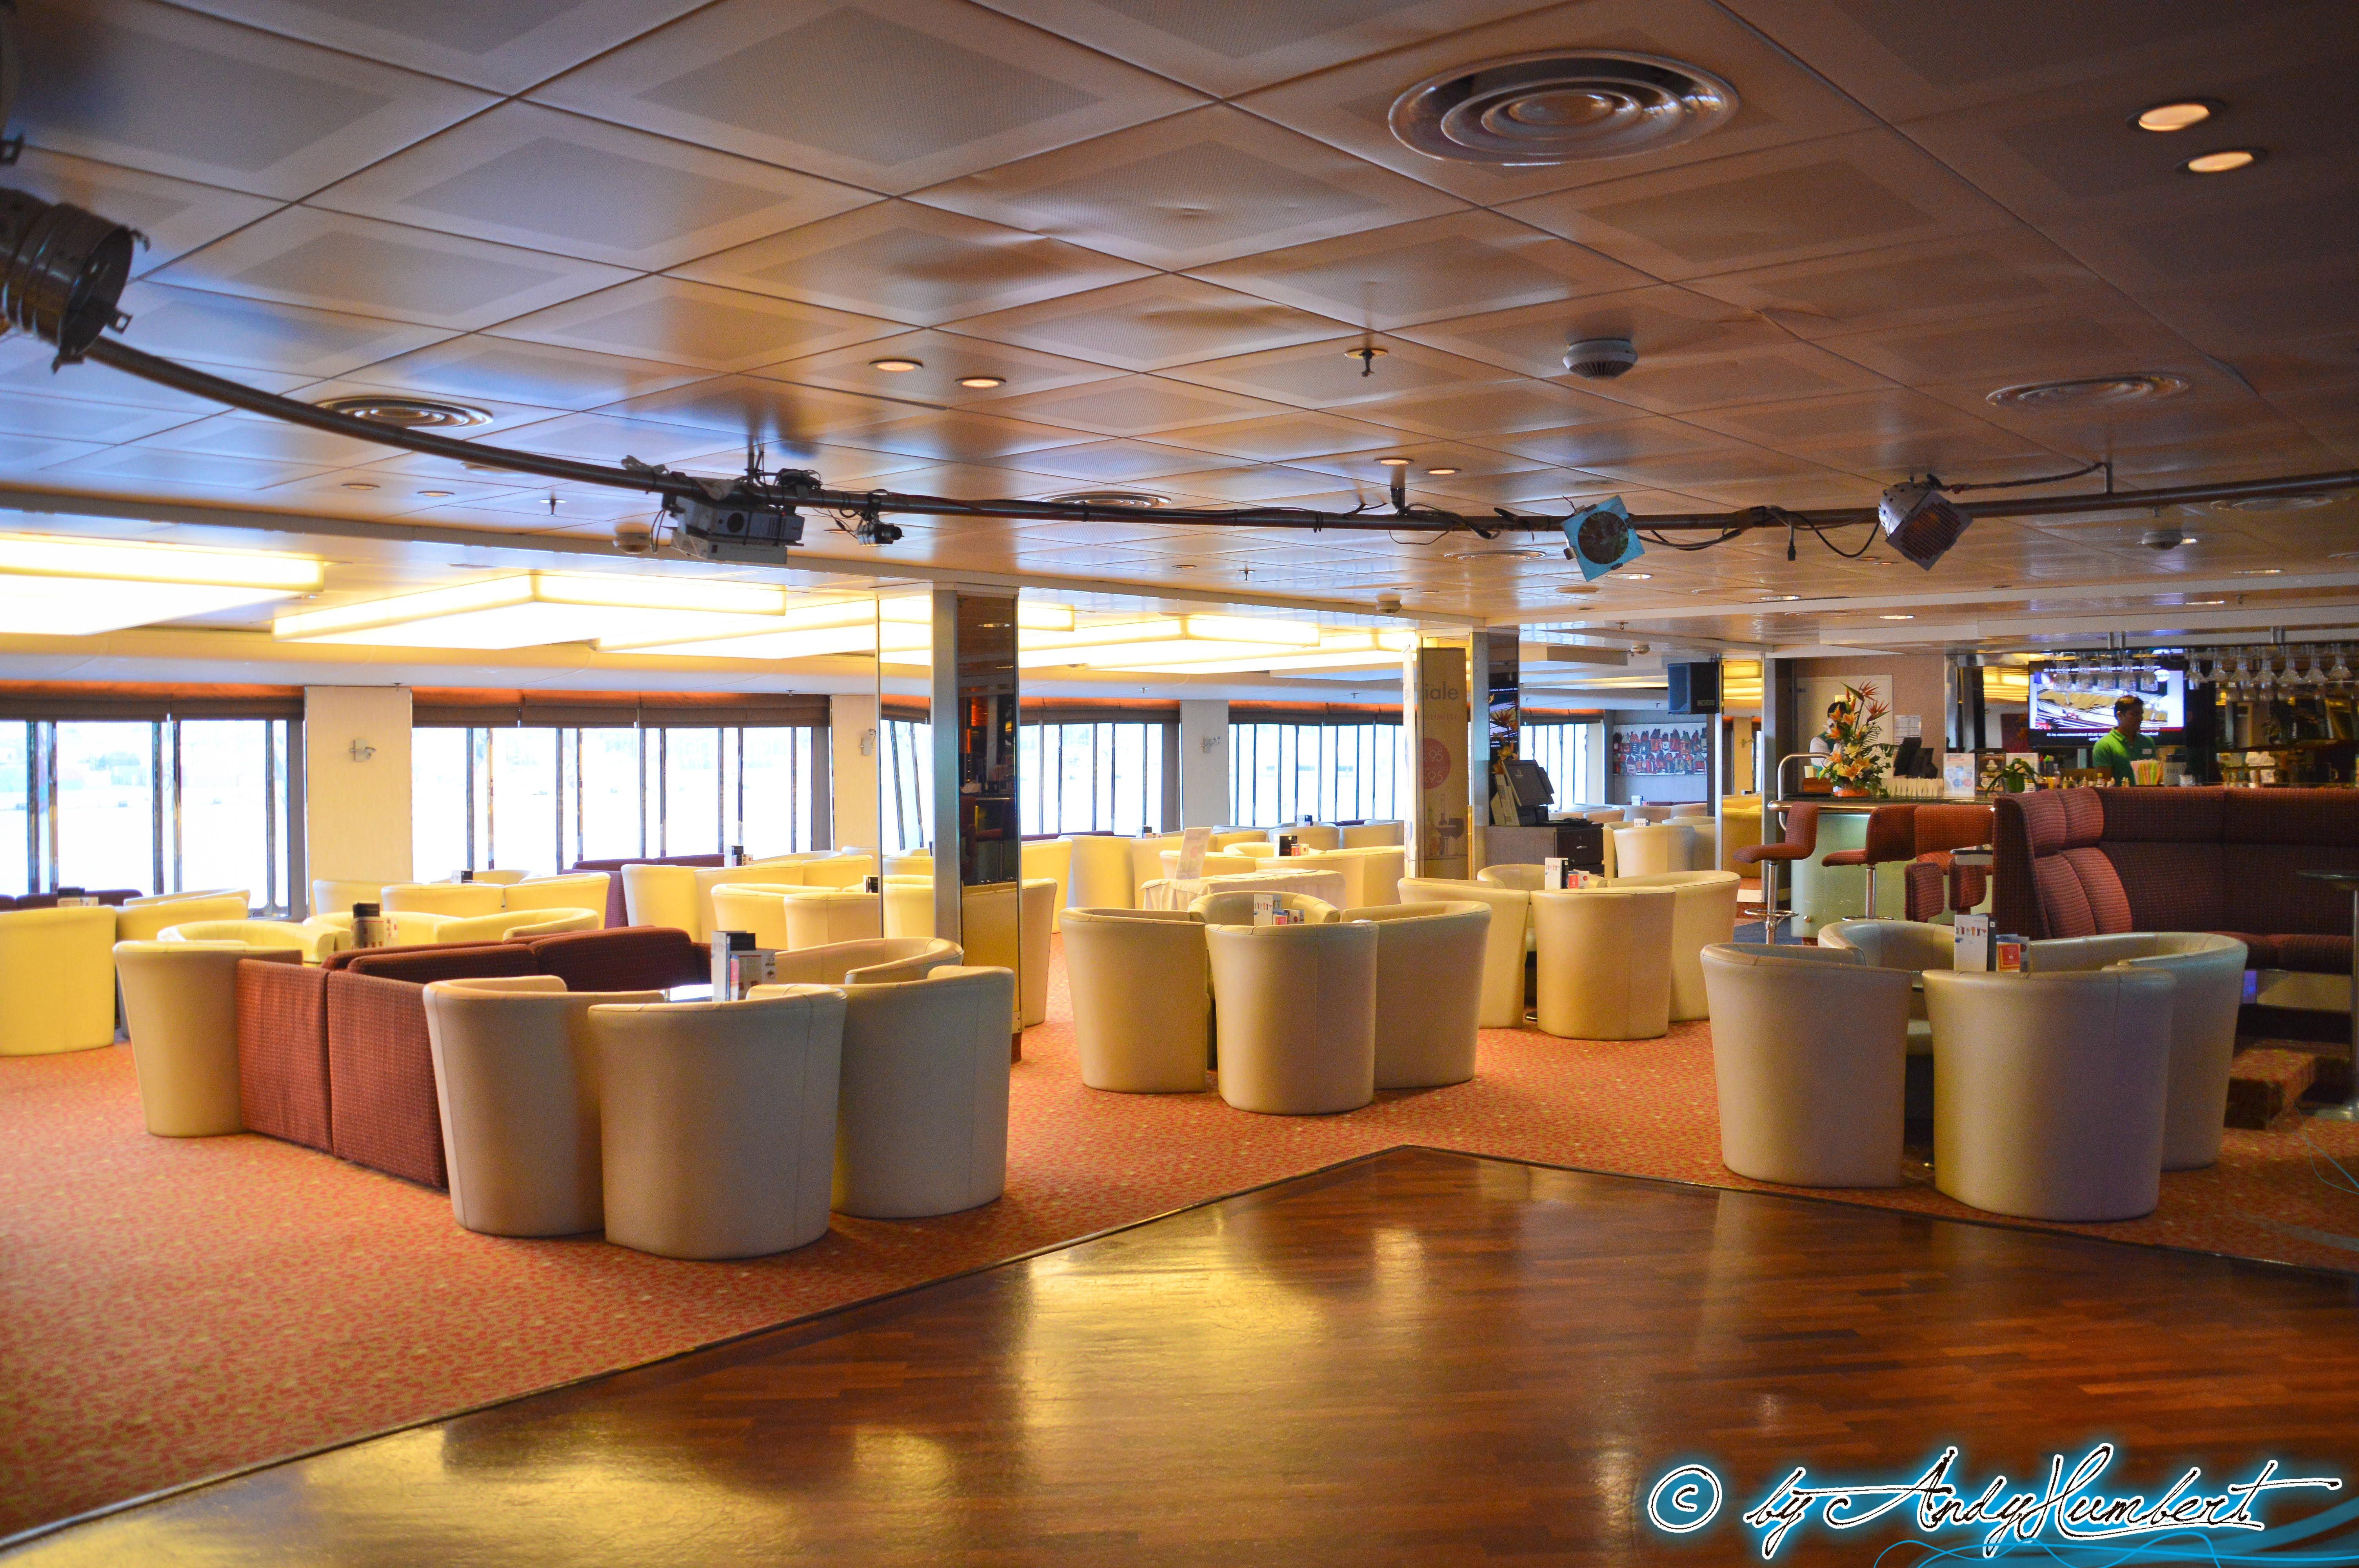 Reflections Lounge & Bar (pont 8)